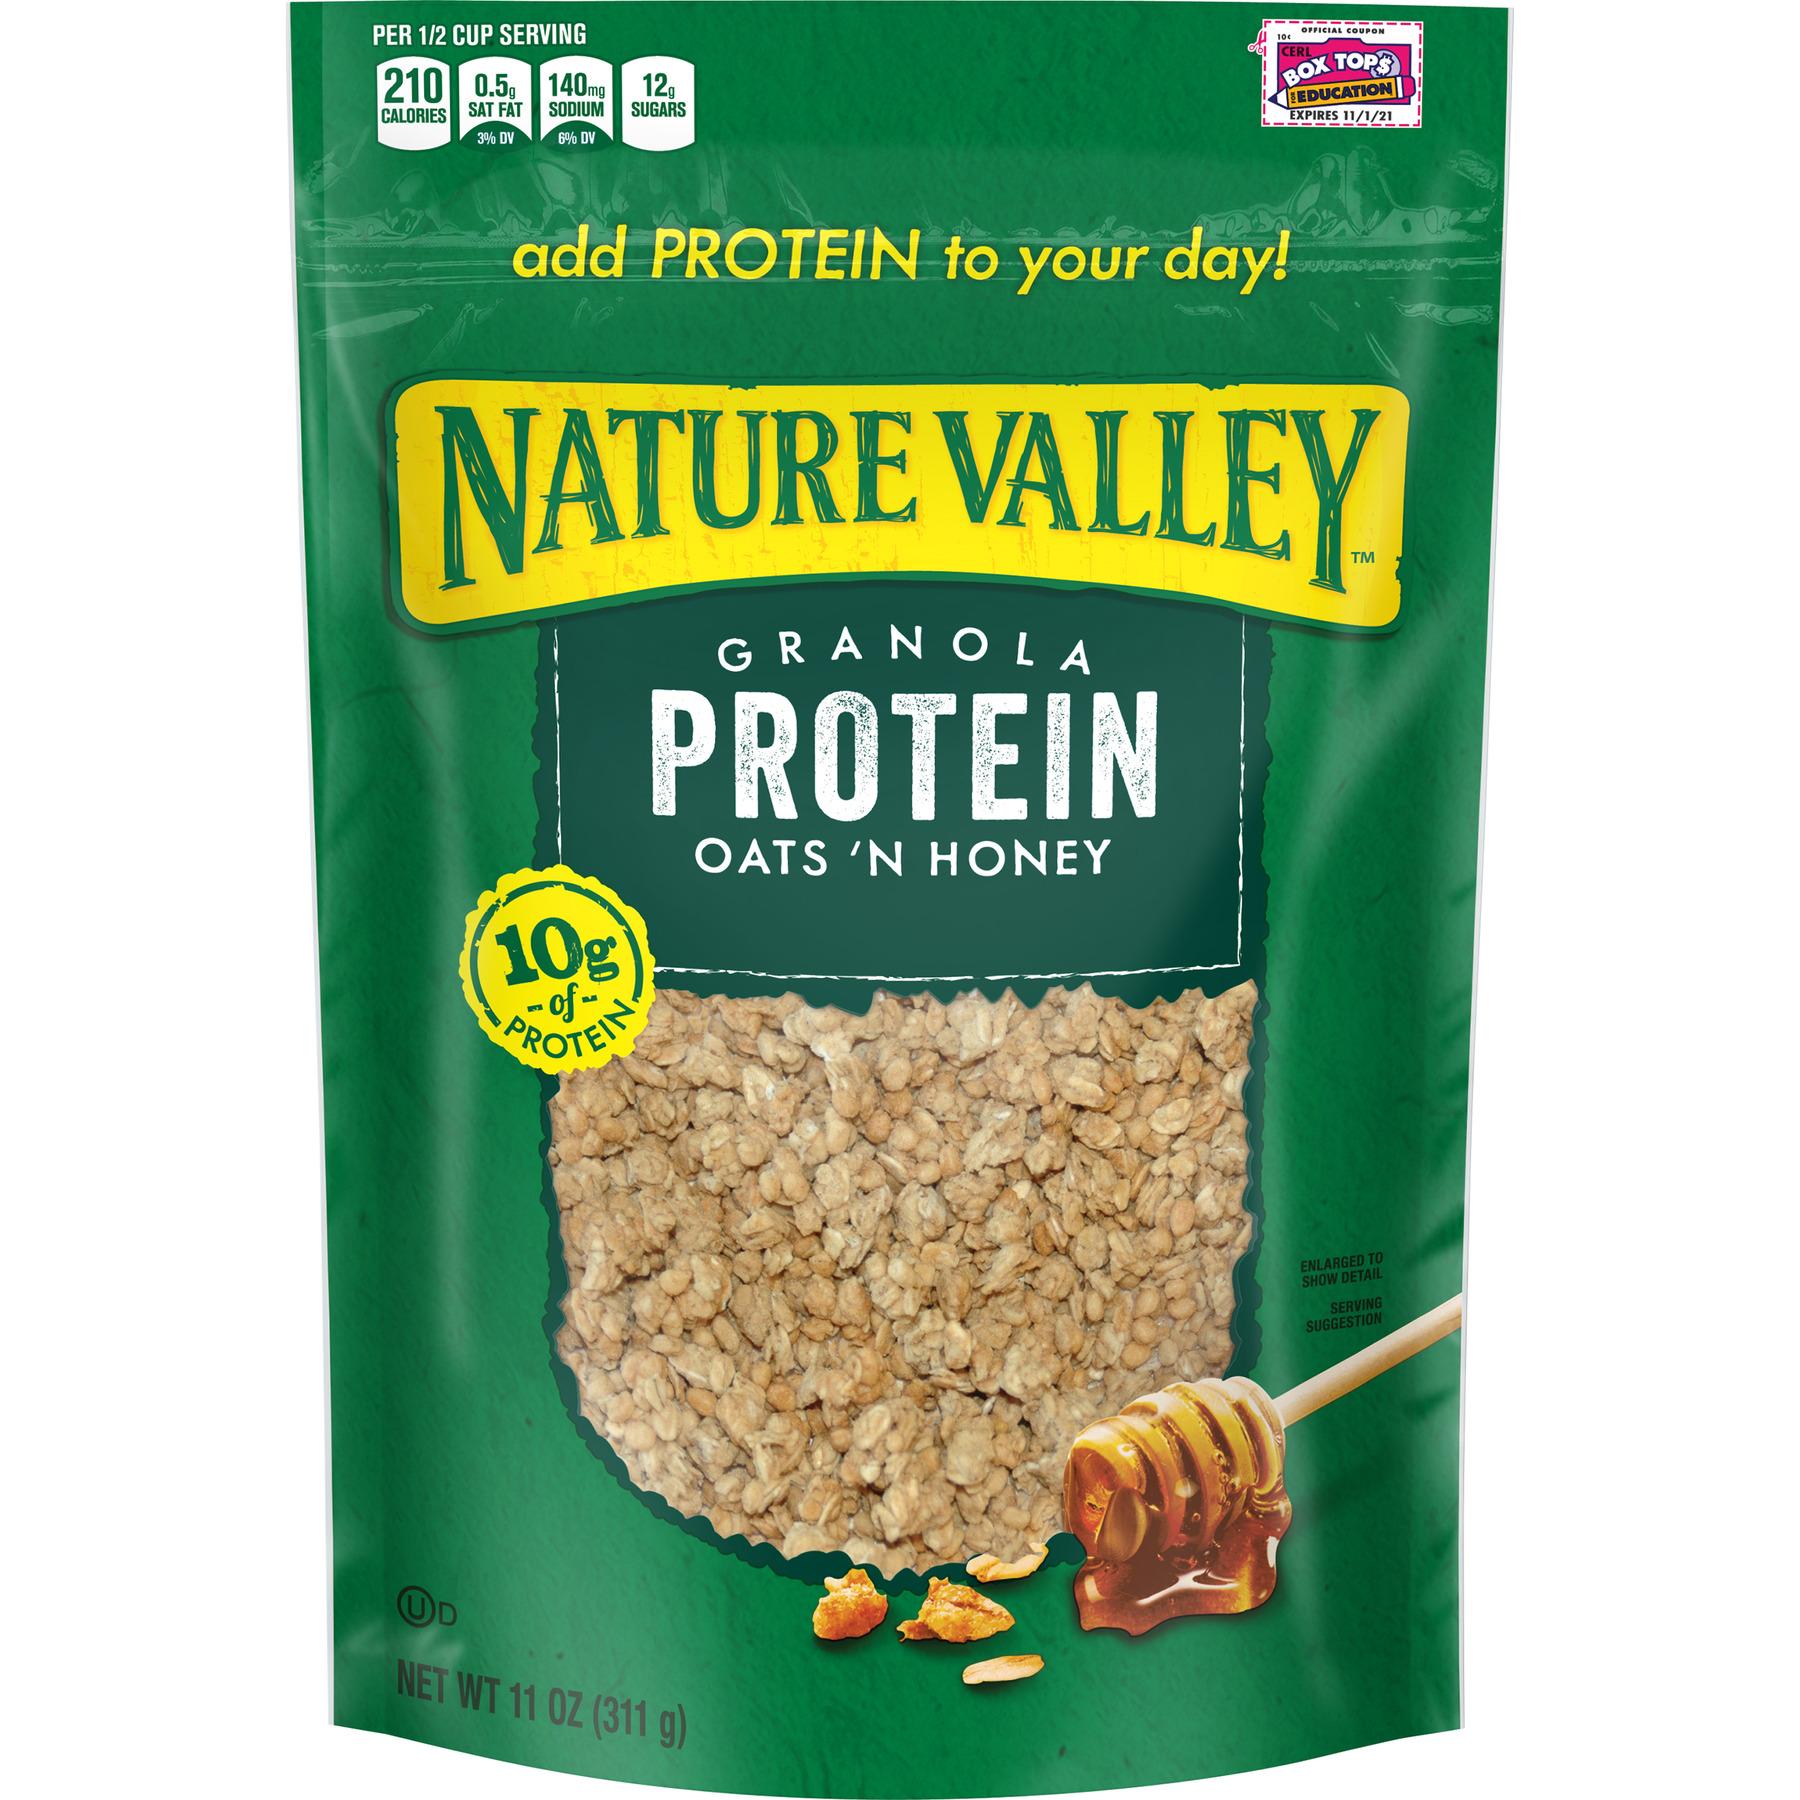 Nature Valley Granola, Protein, Oats N' Honey, Crunchy Granola Bag, 11 oz